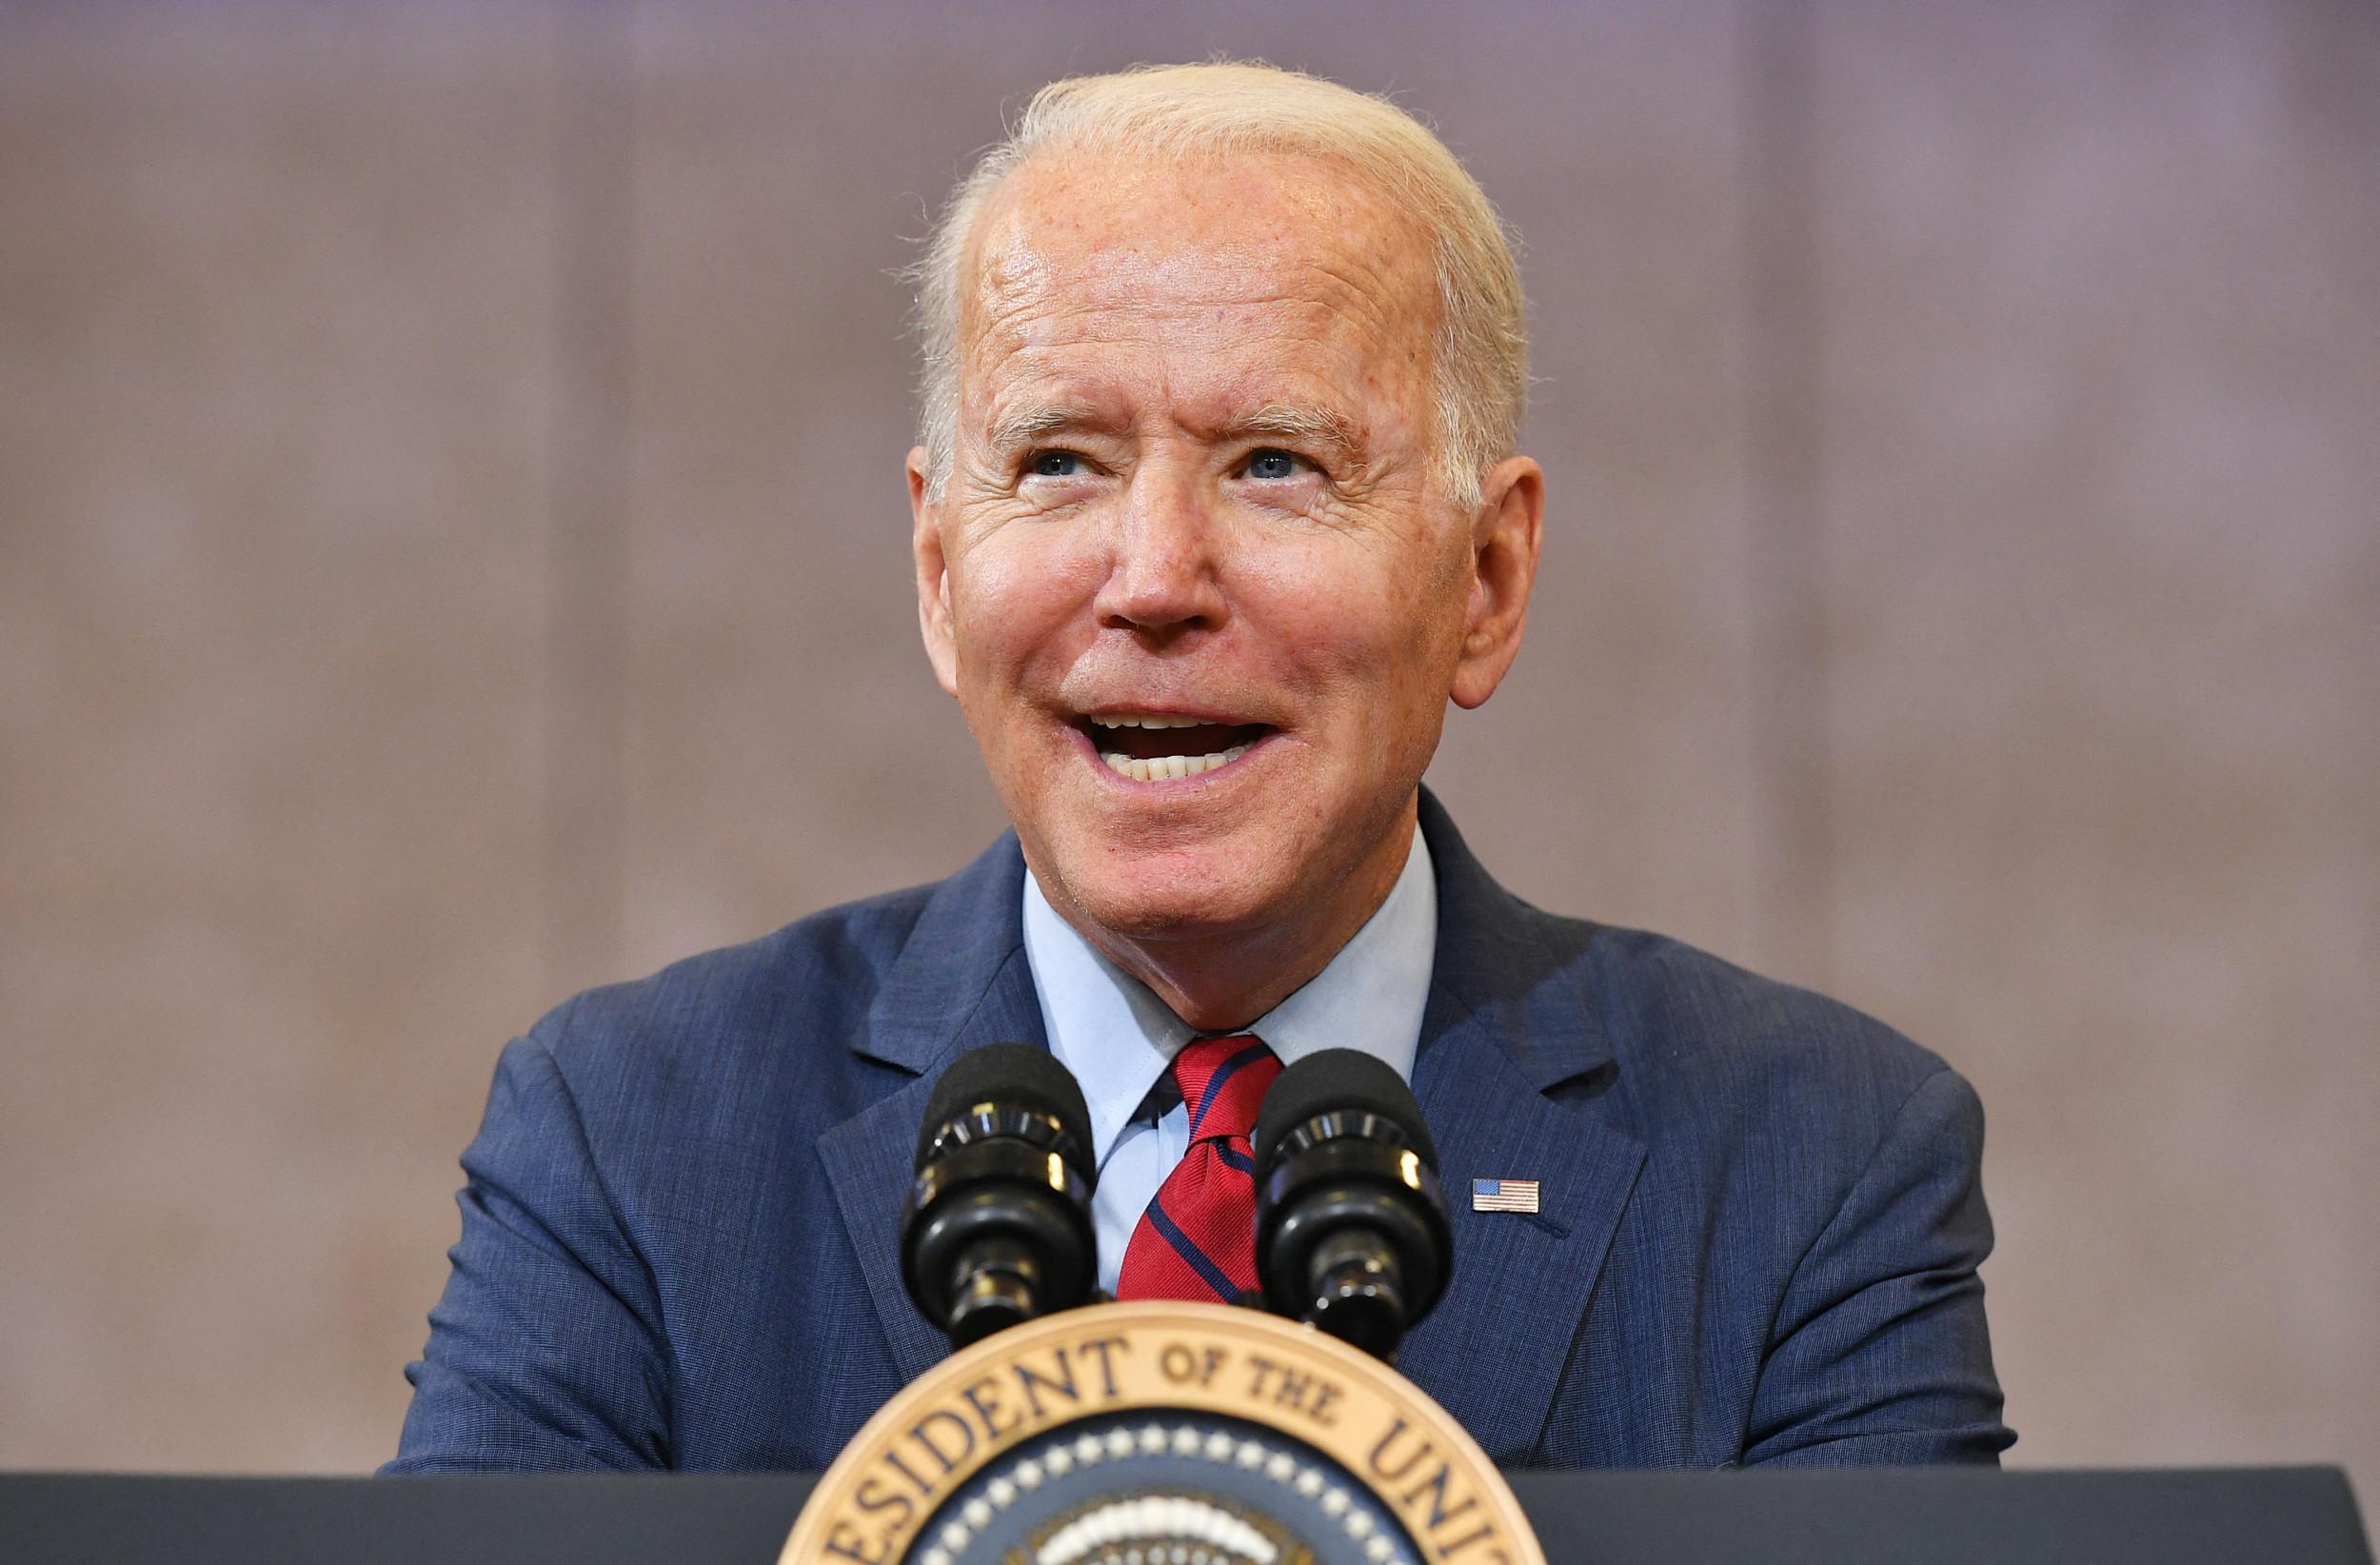 Joe Biden saying 'Latinx' sparks widespread mockery, wave of jokes